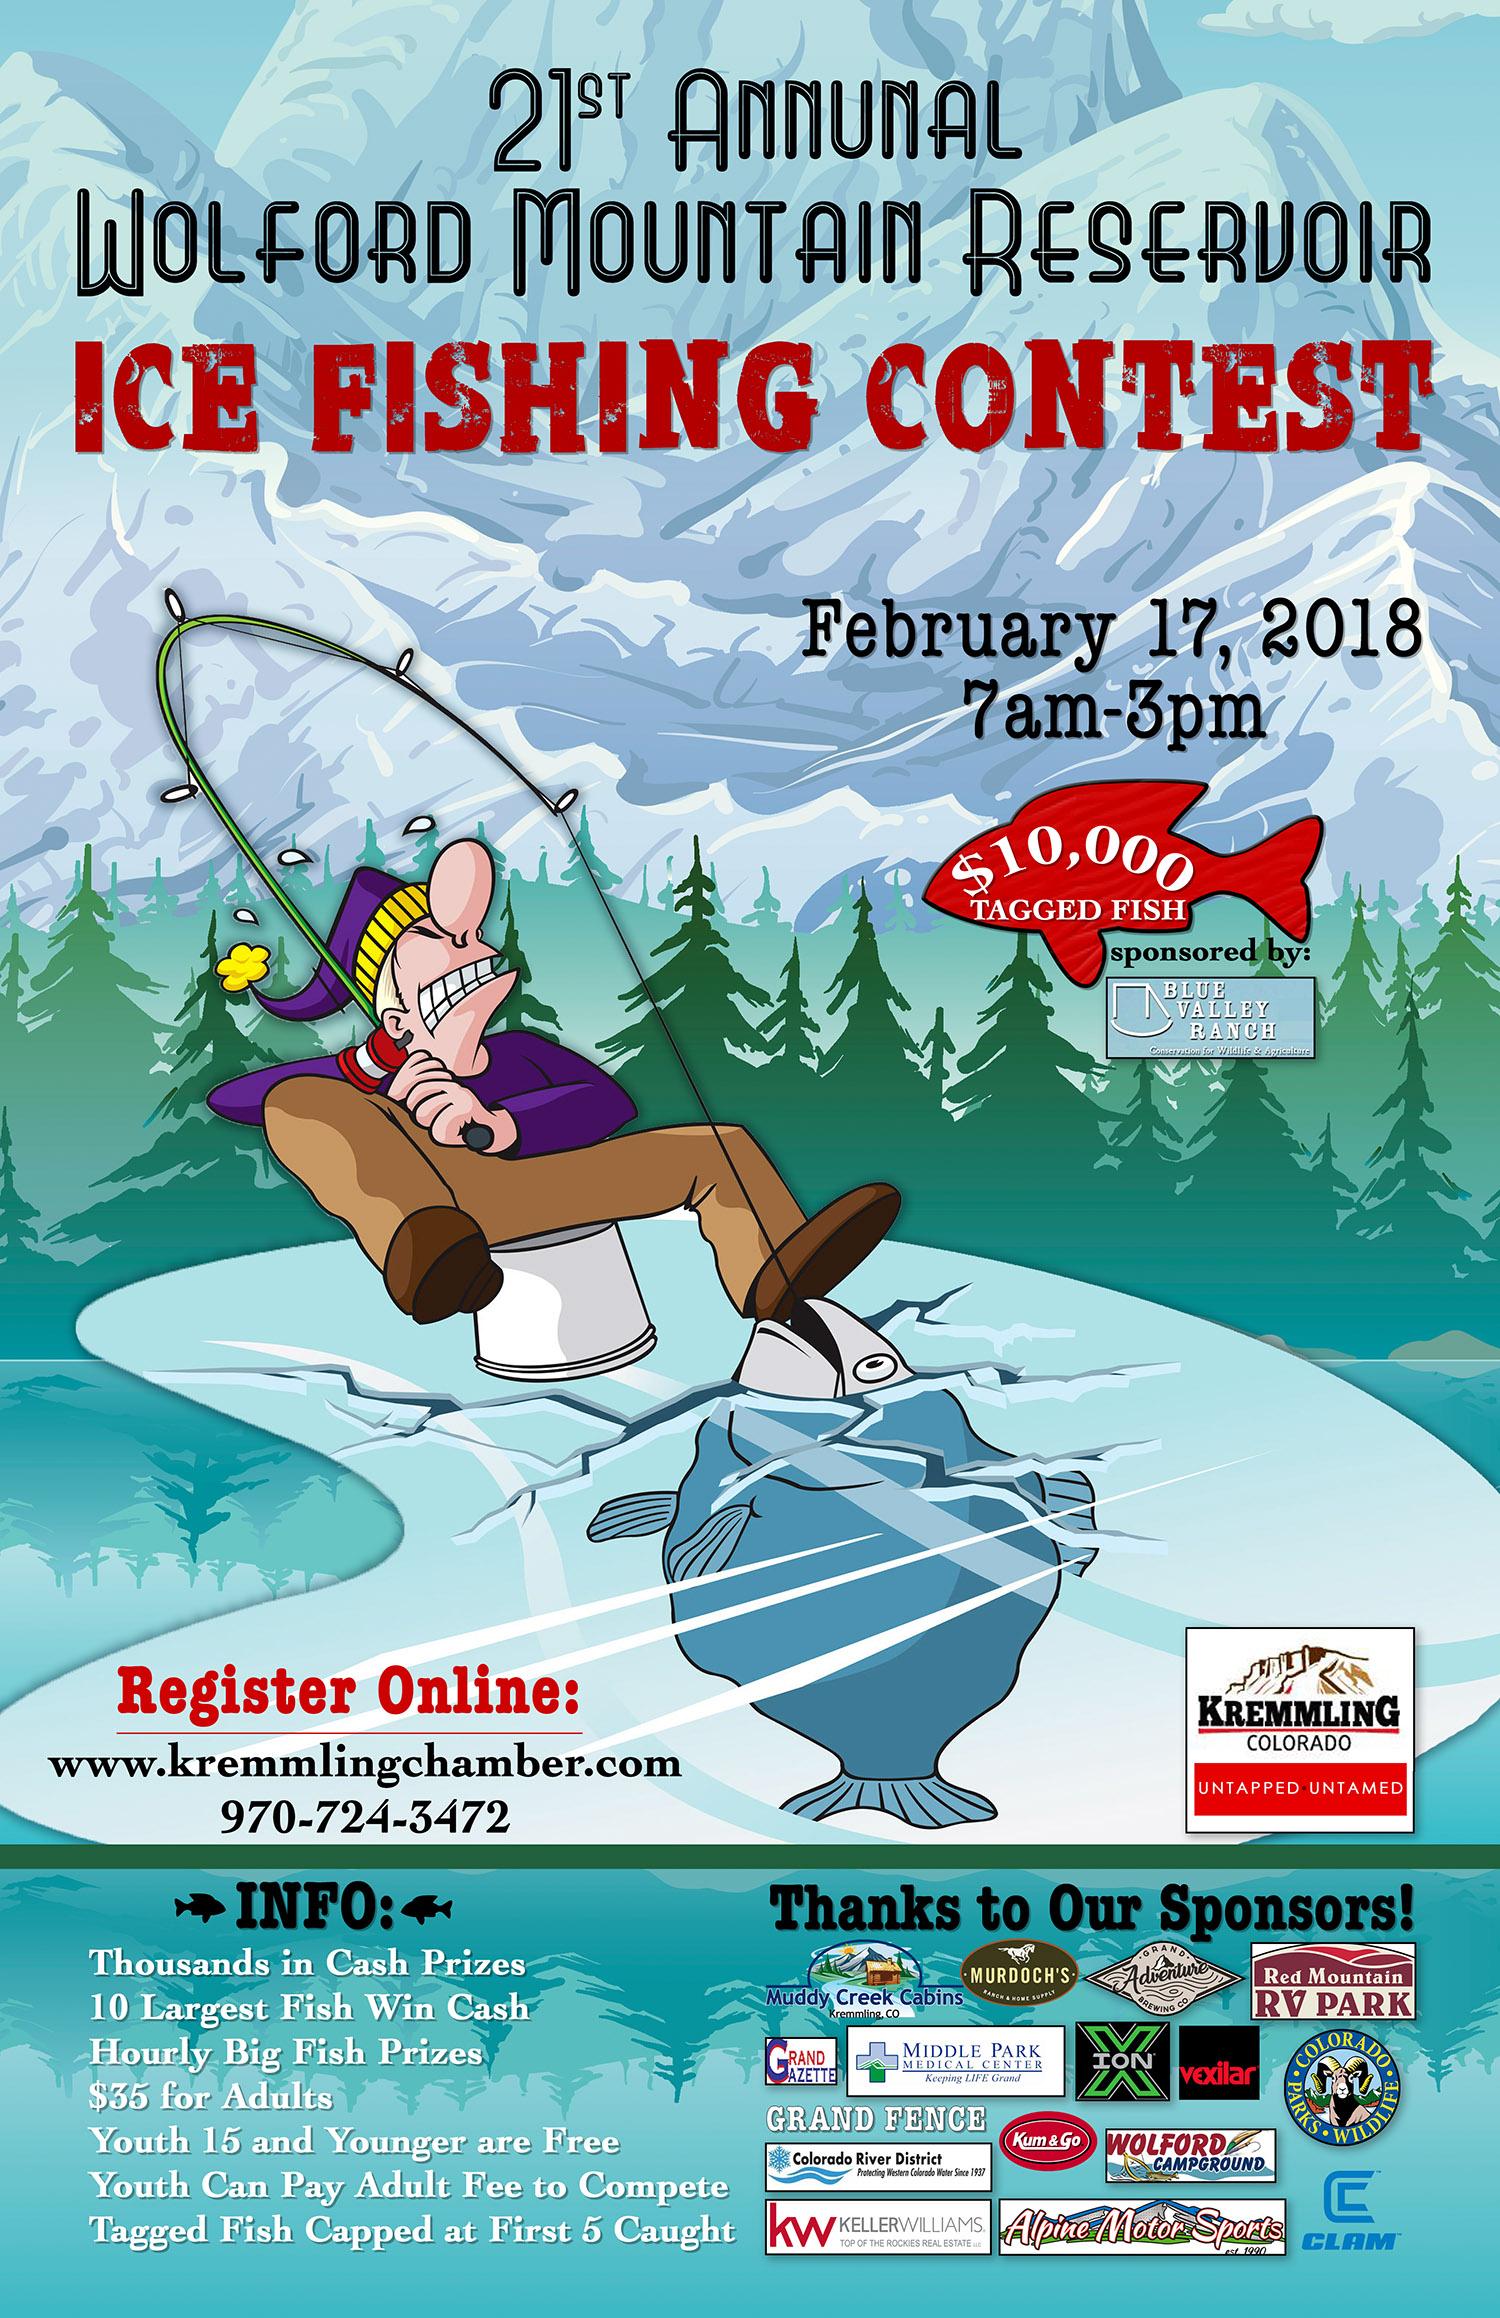 Wolford ice fishing tournament 2018 tickets fri feb 16 for Ice fishing tournament